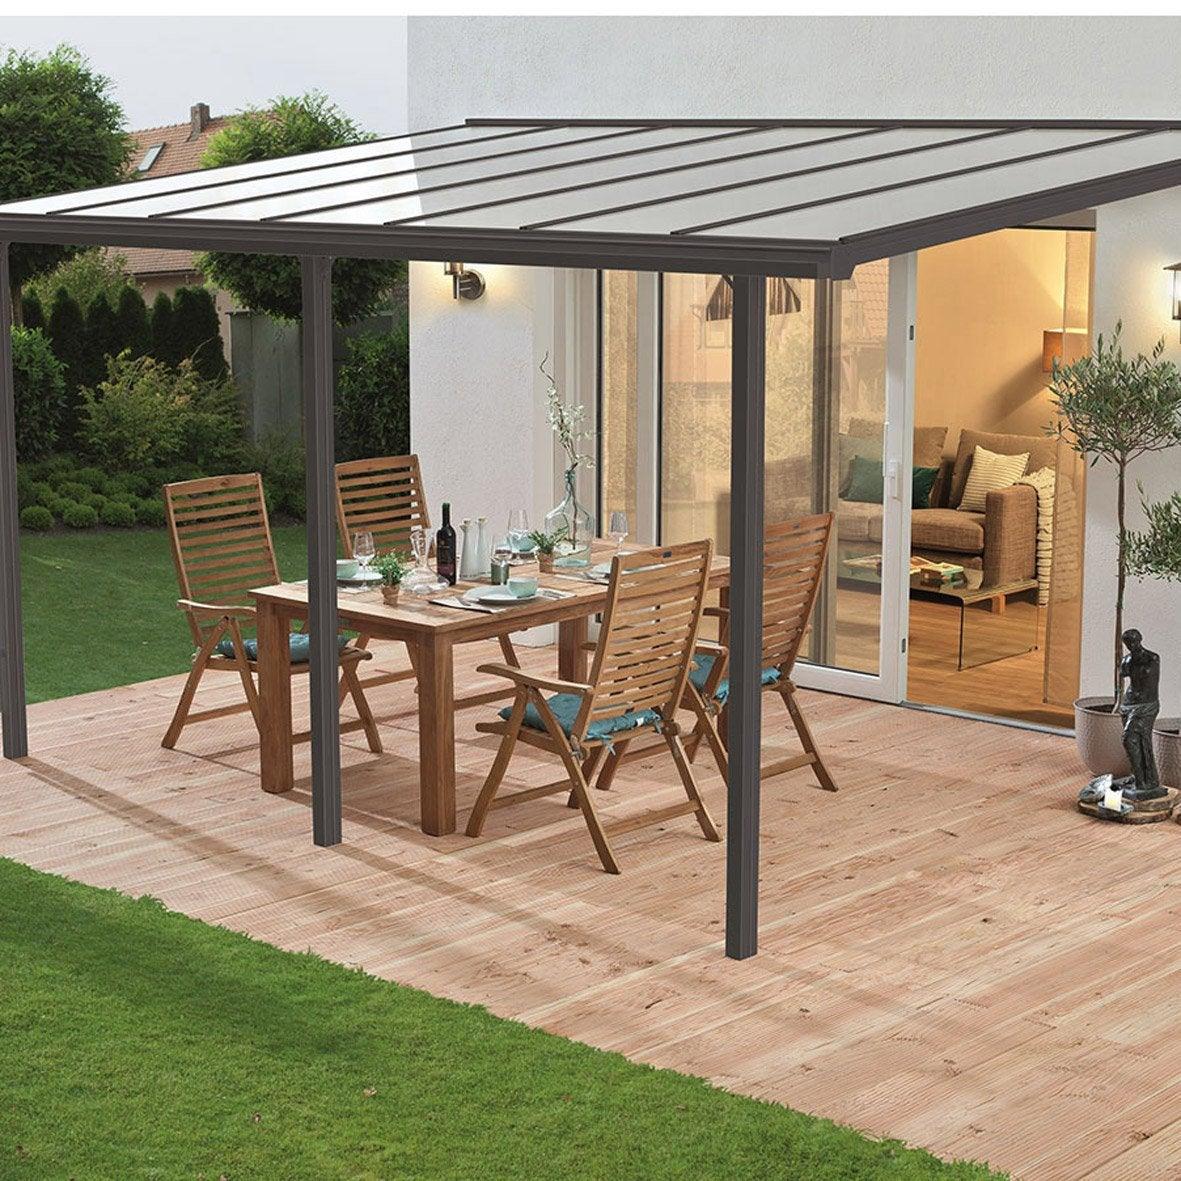 couverture de terrasse adoss e tradition aluminium gris m leroy merlin. Black Bedroom Furniture Sets. Home Design Ideas